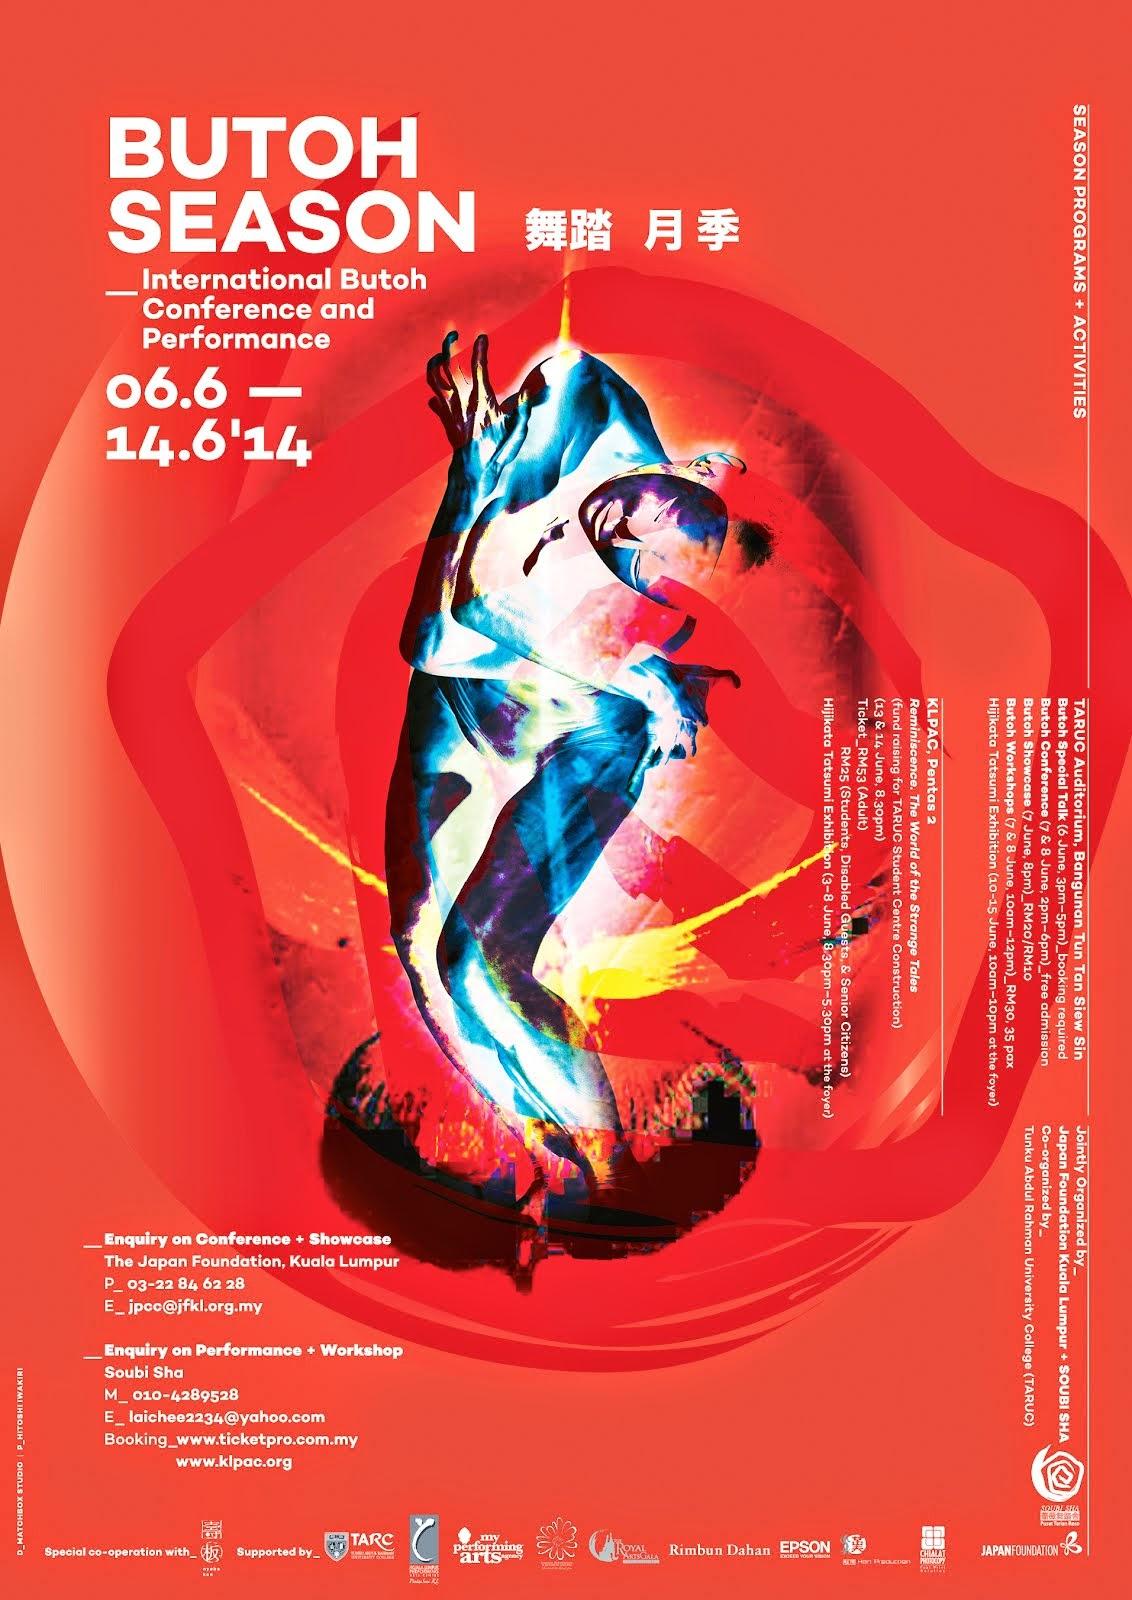 Butoh Season 2014